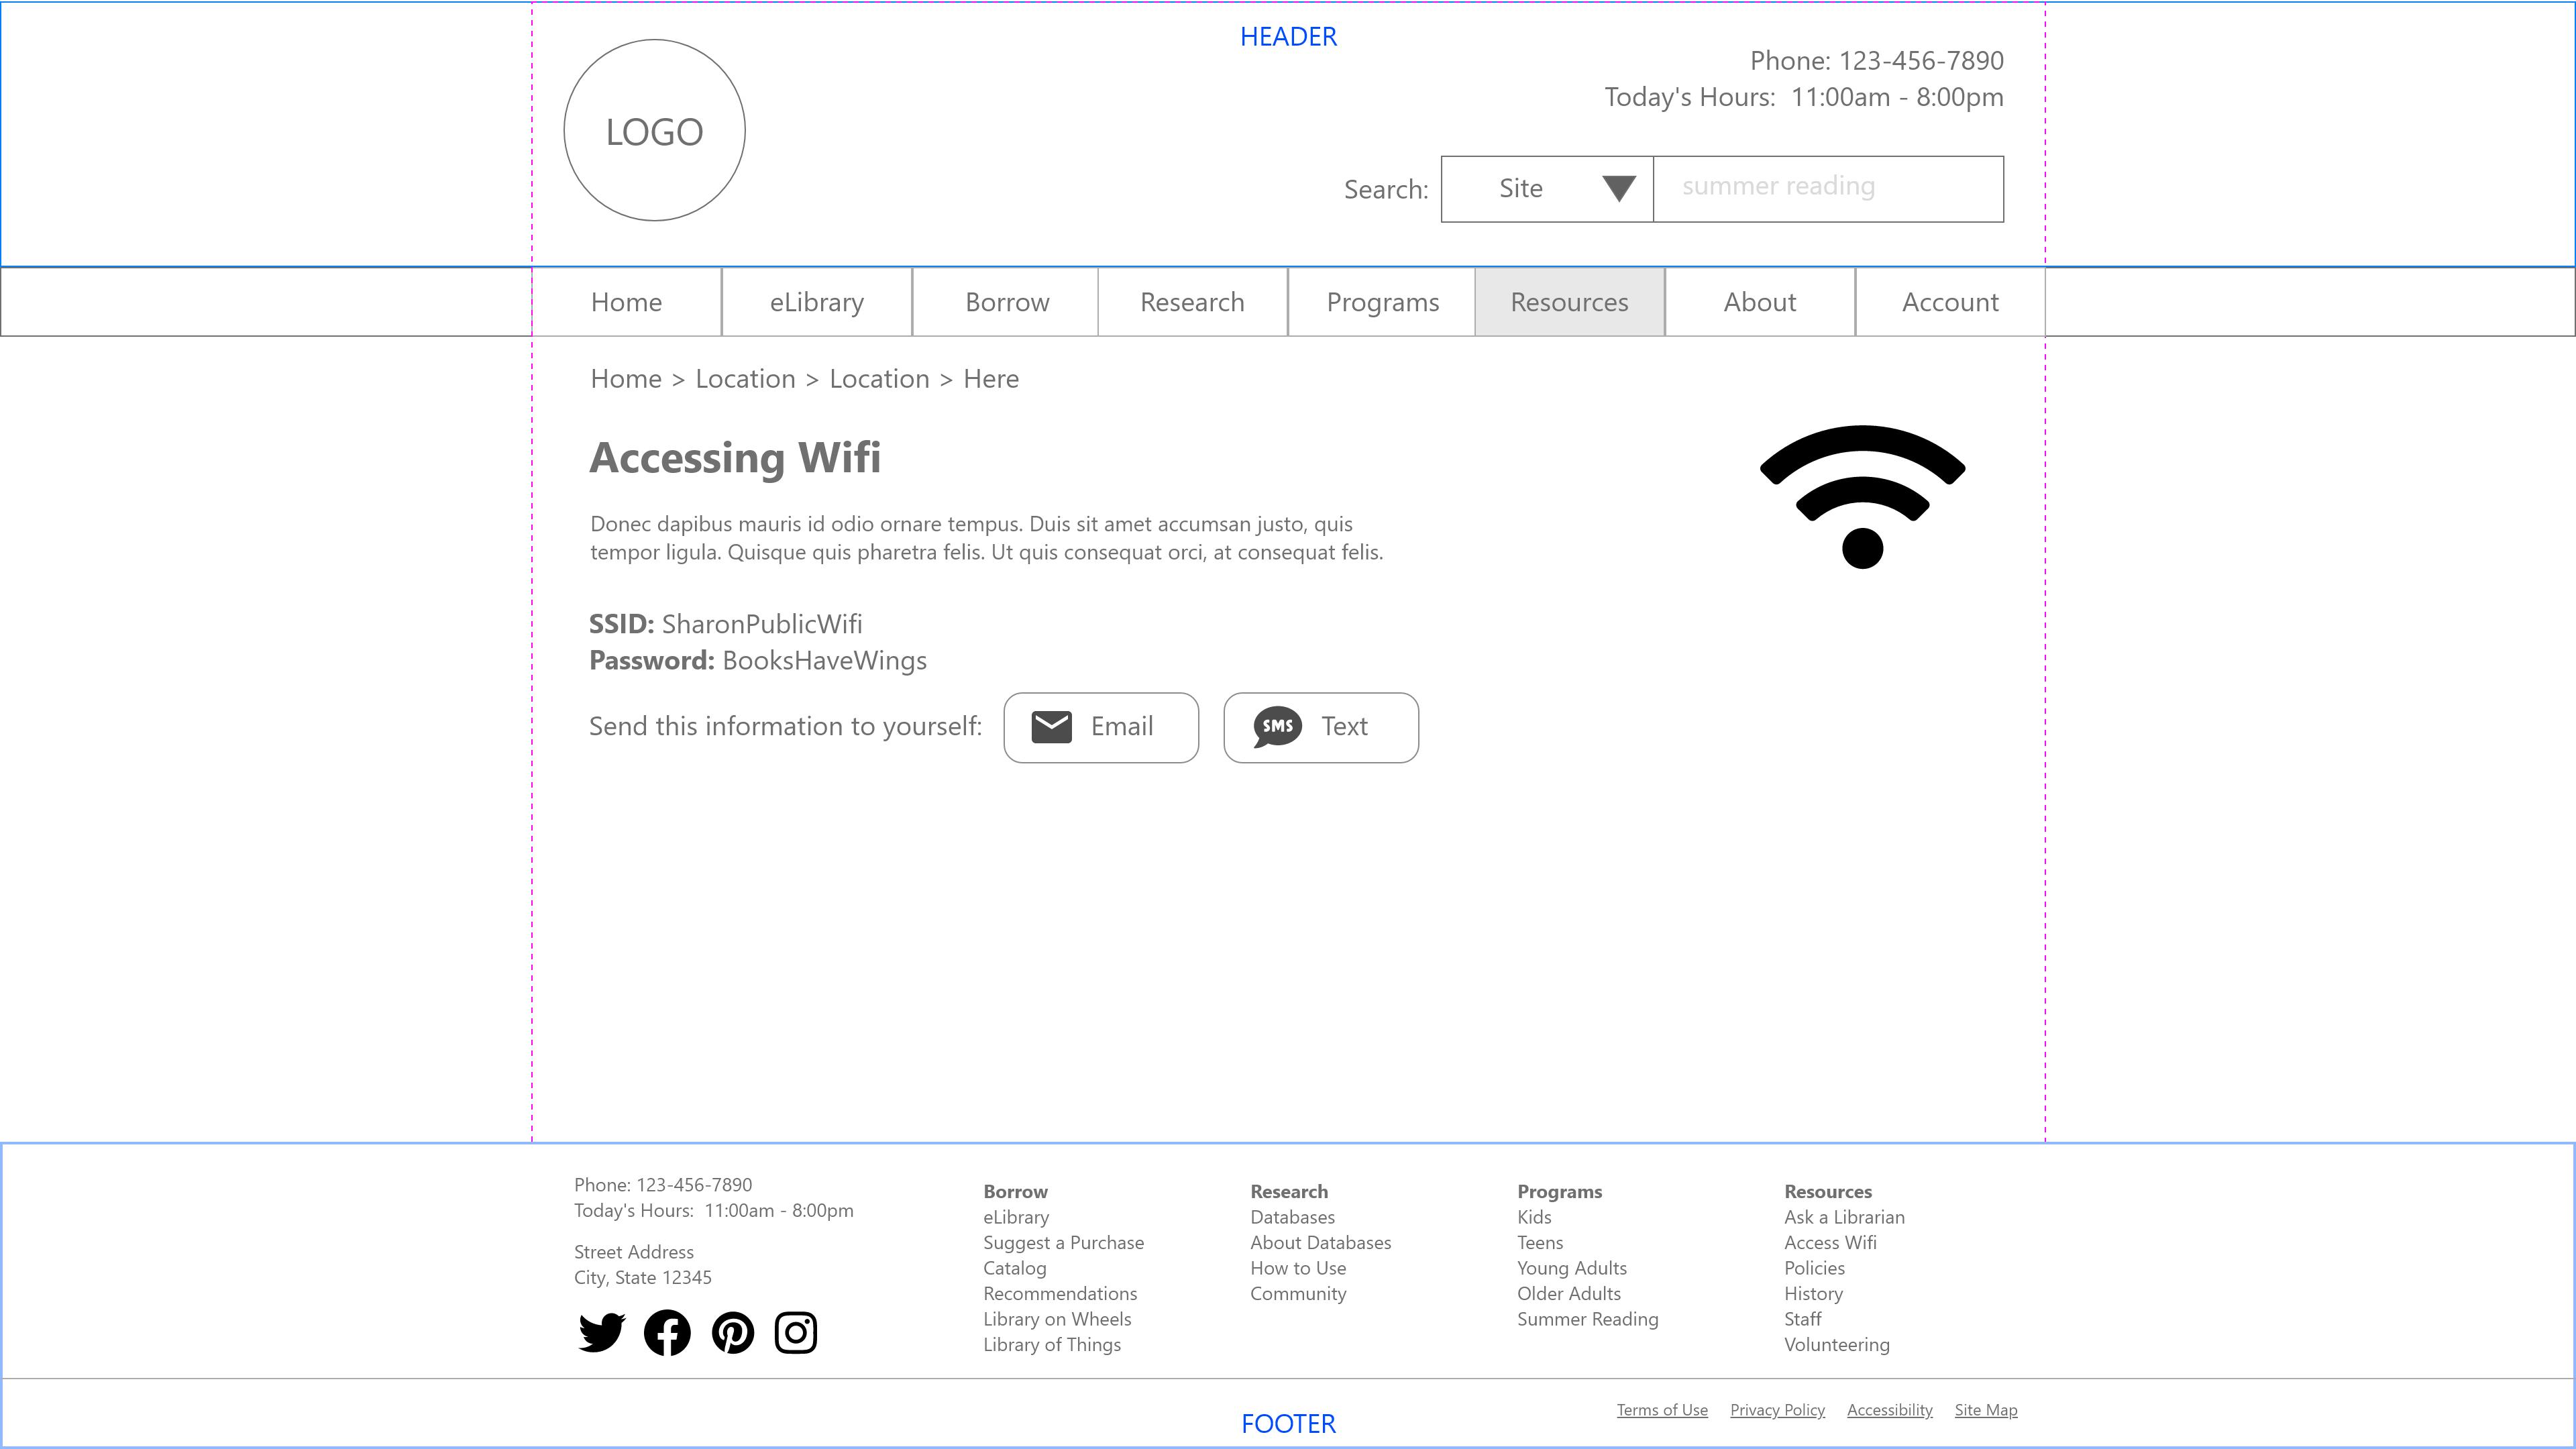 Accessing Wifi